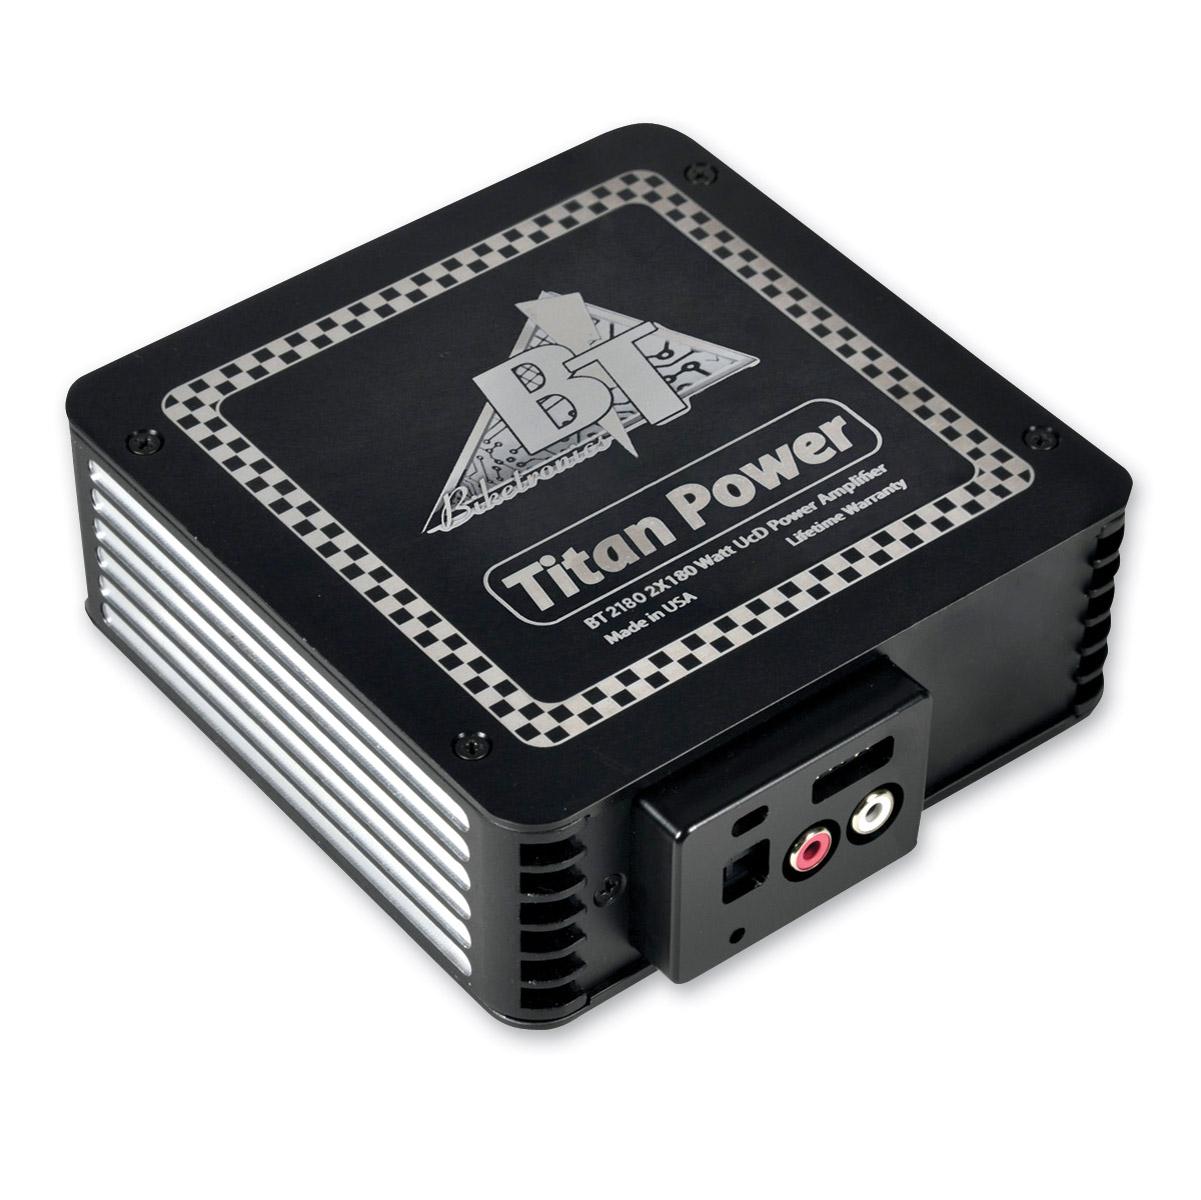 Biketronics Titan 2-Channel Amplifier